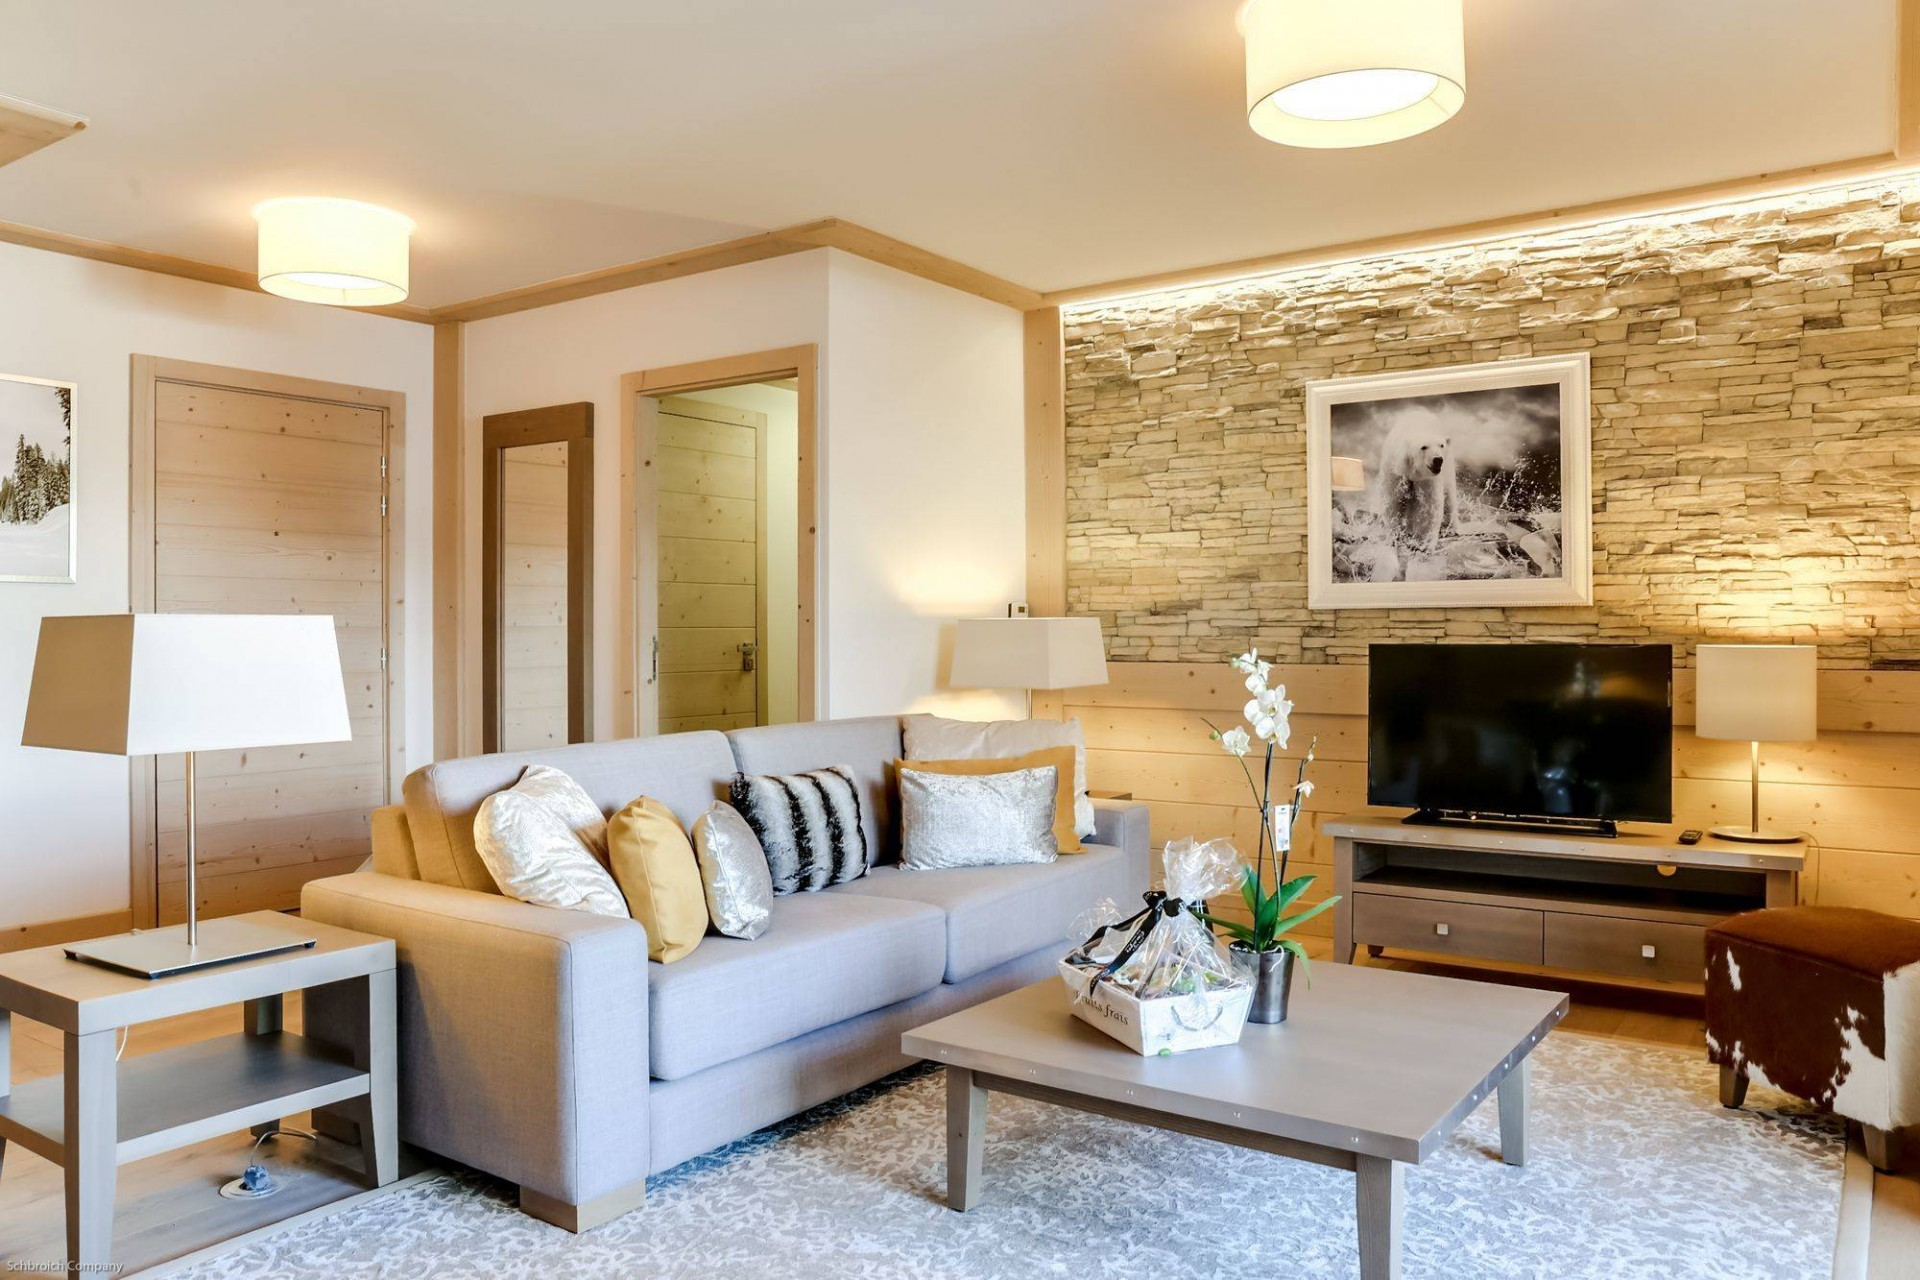 Courchevel 1550 Luxury Rental Appartment Telamite Living Room 2